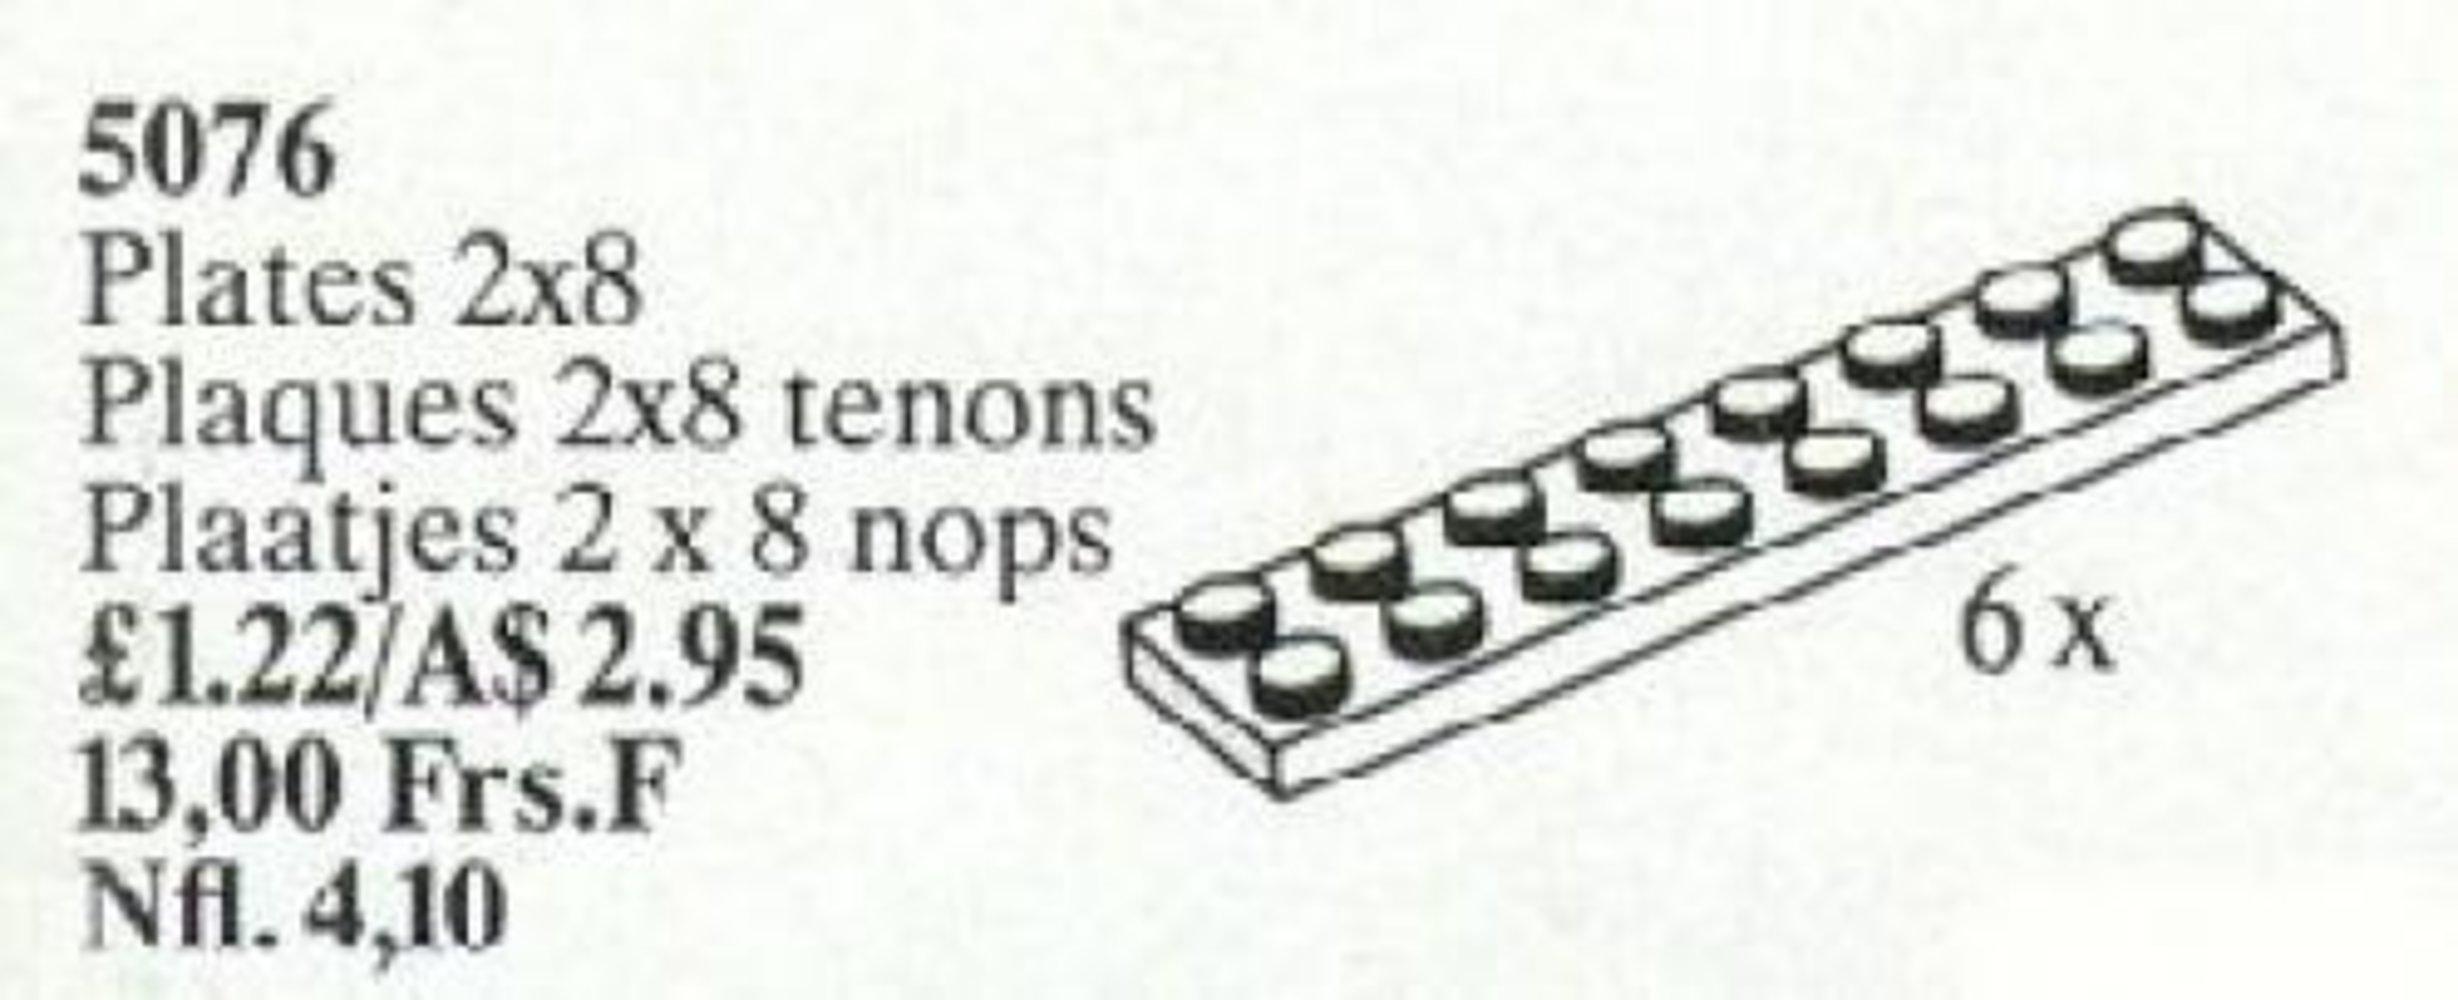 Plates 2 x 8